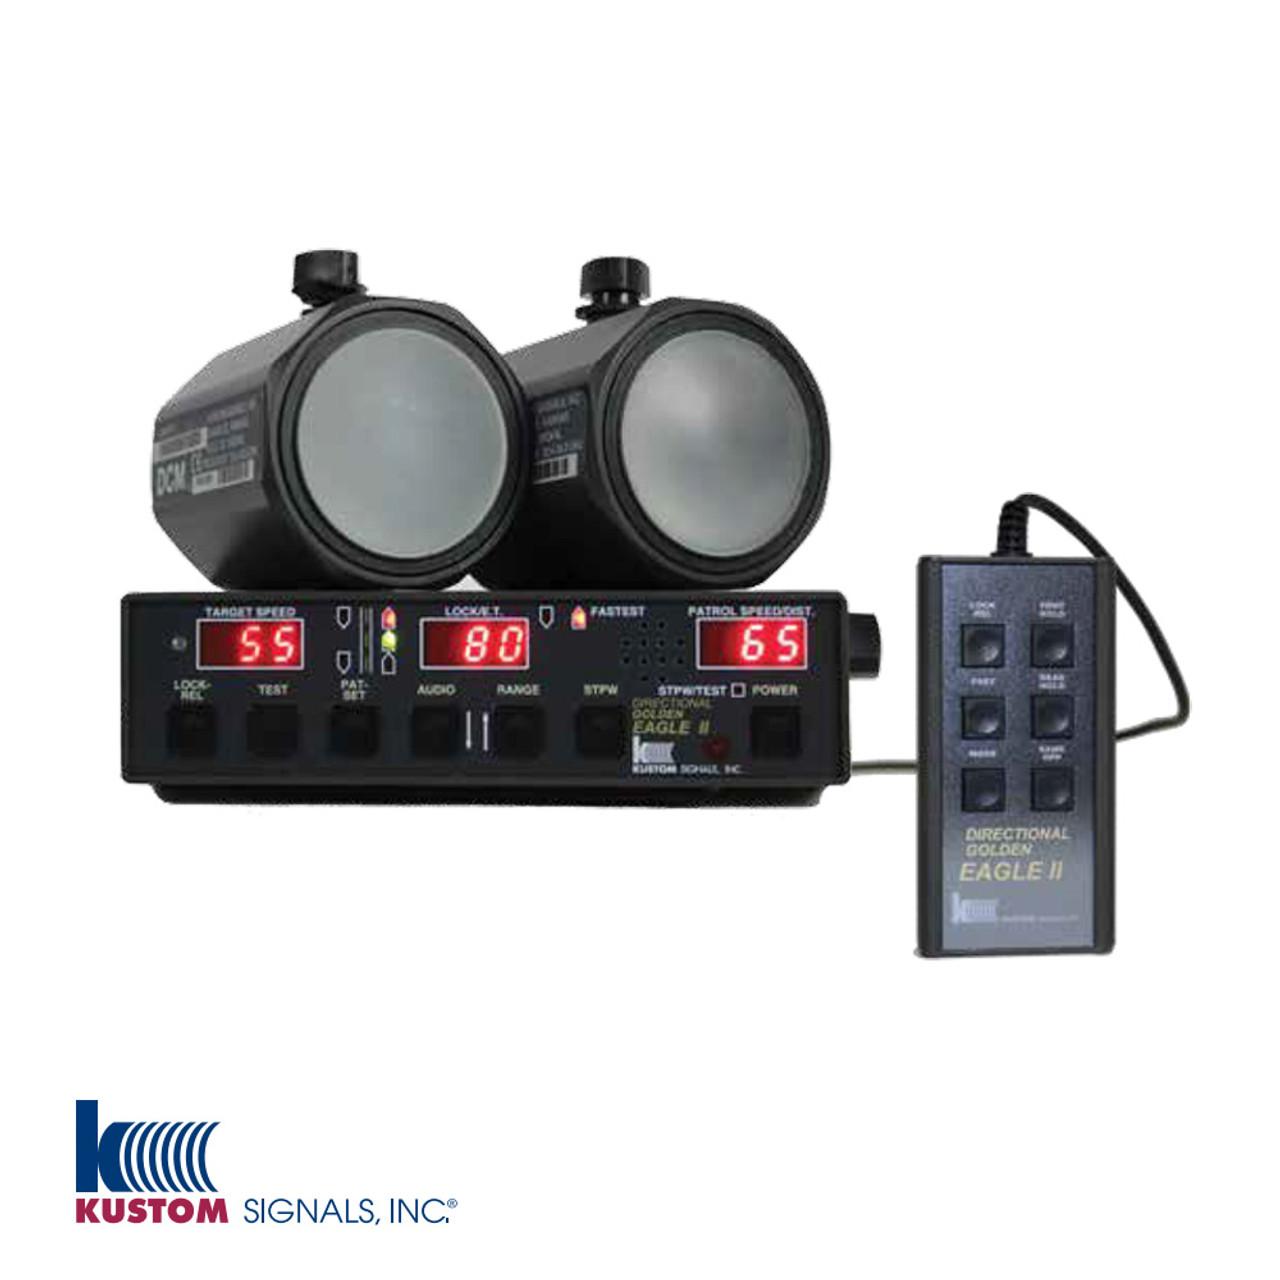 Auto binary kustom signals golden eagle ii radar manual 51280.